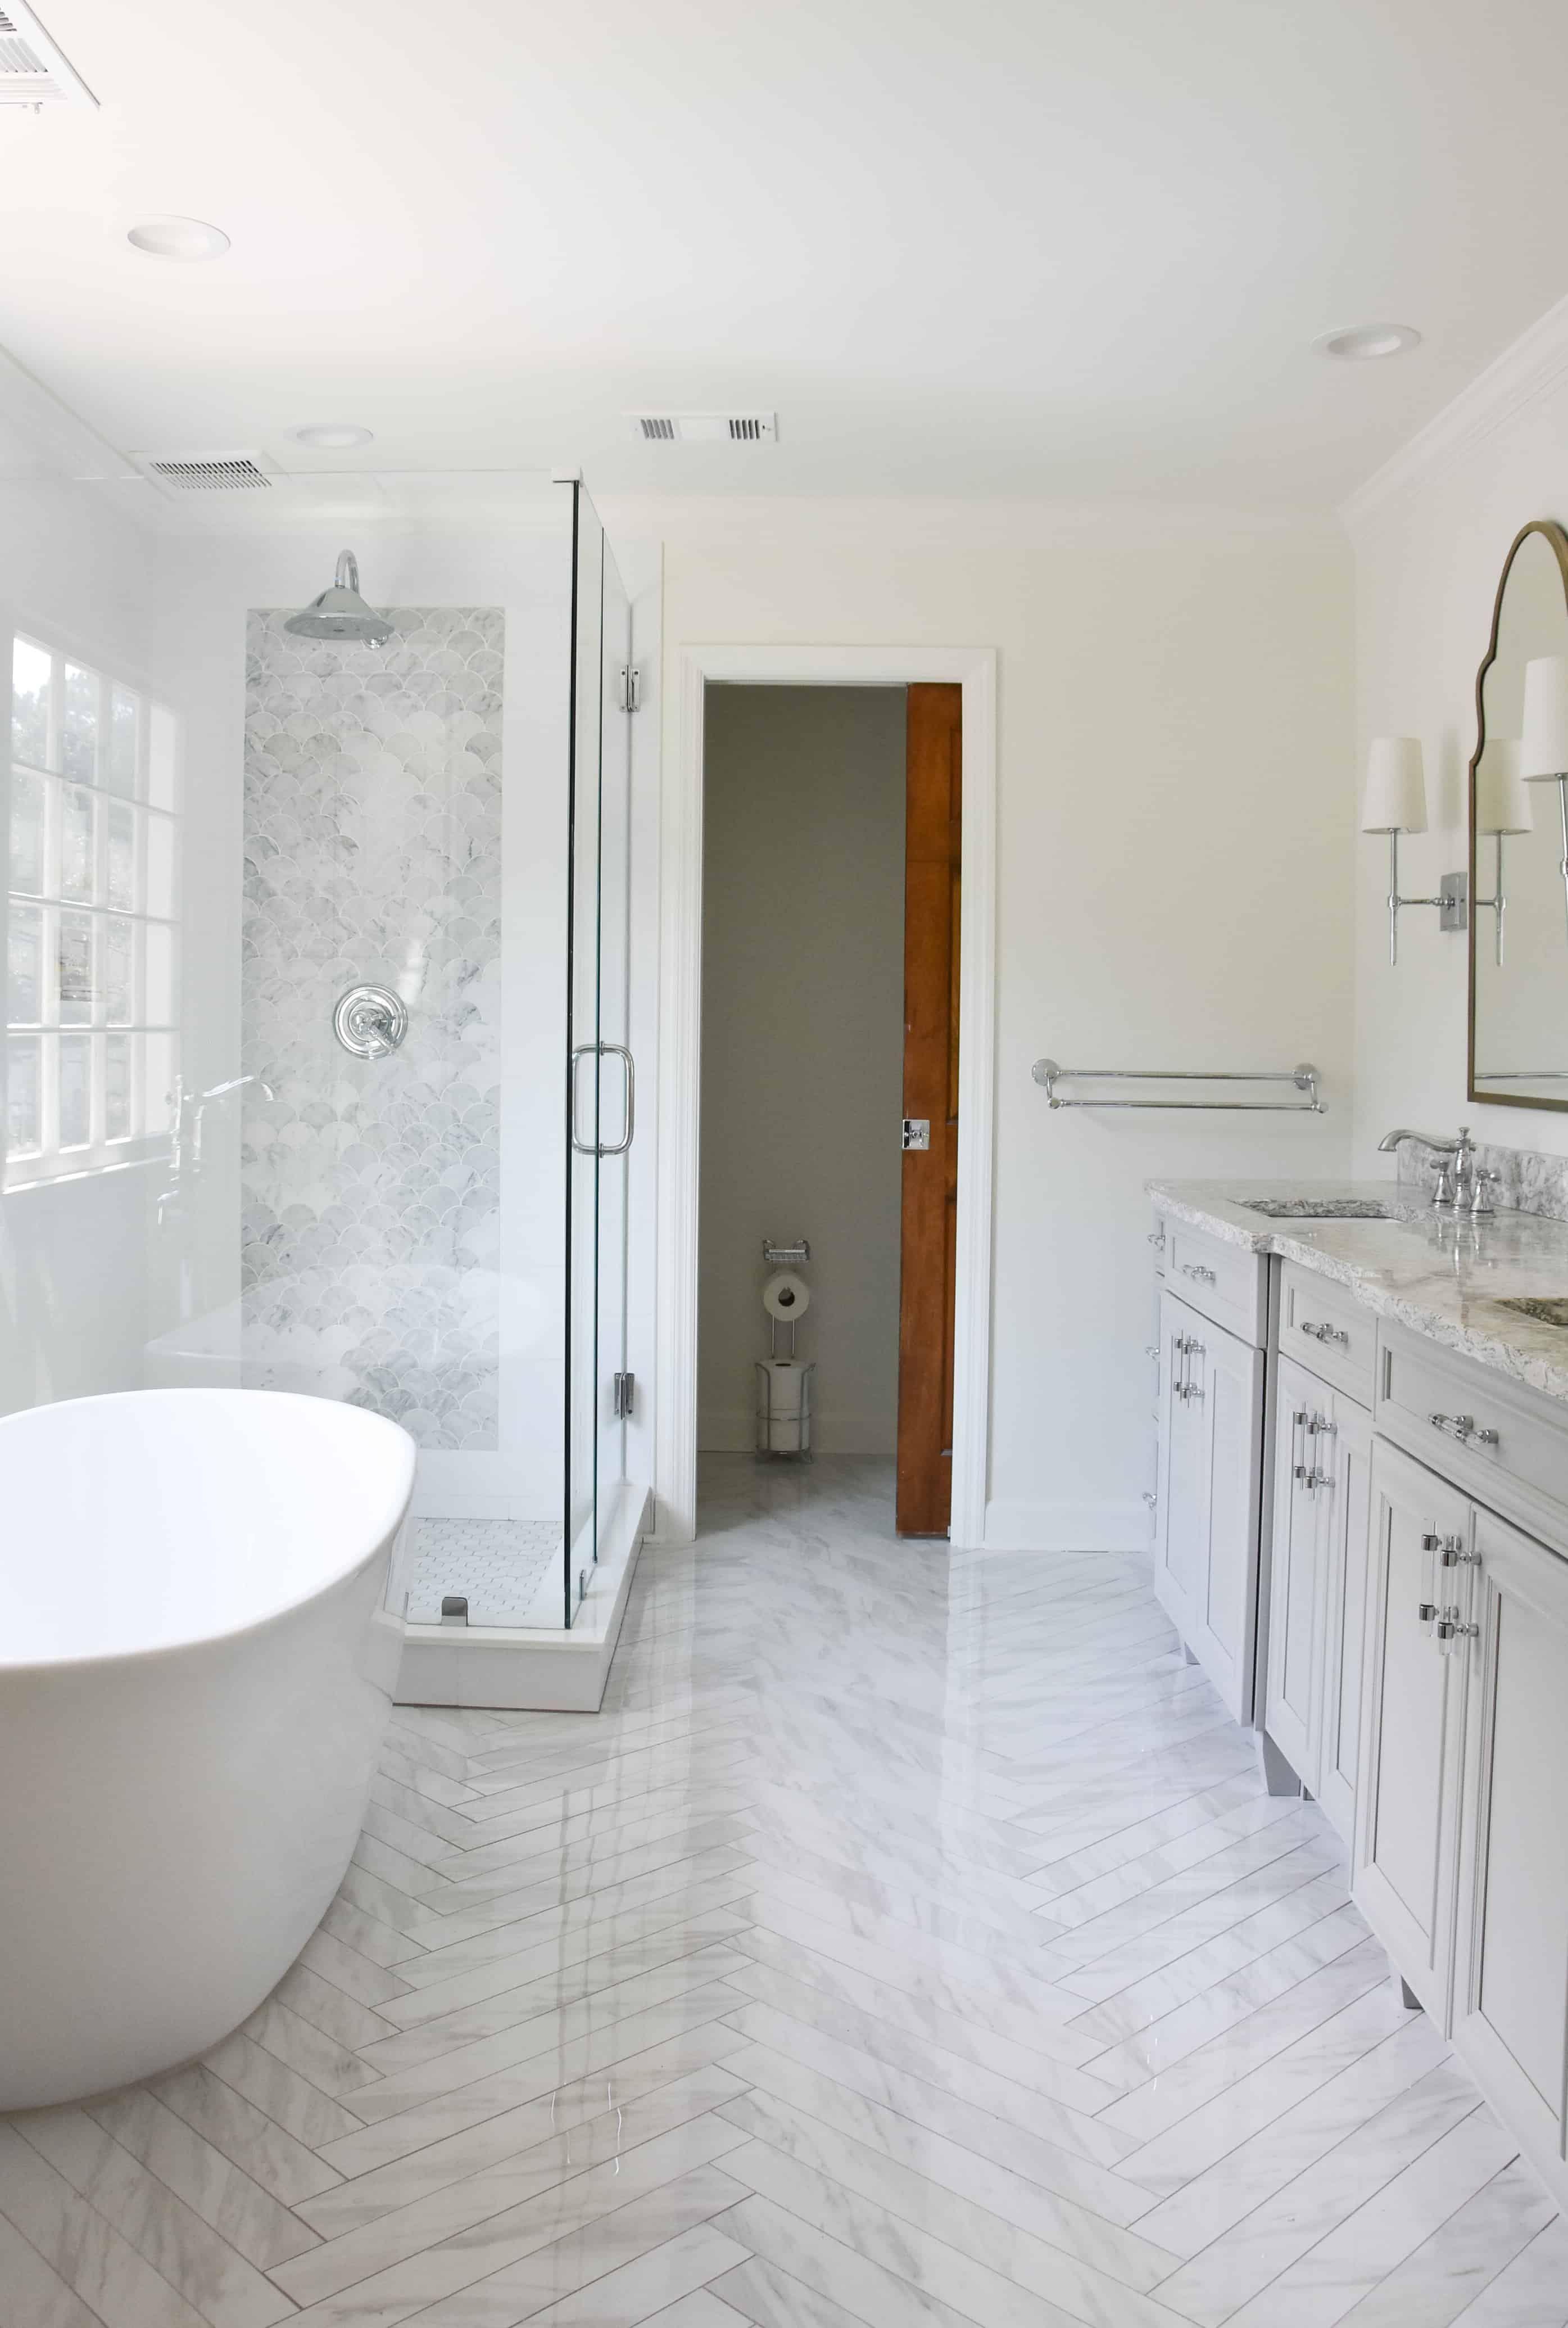 Master Bathroom Week 6 Construction Update The New Bathroom In 2020 Budget Bathroom Remodel Master Bathroom Design Bathrooms Remodel